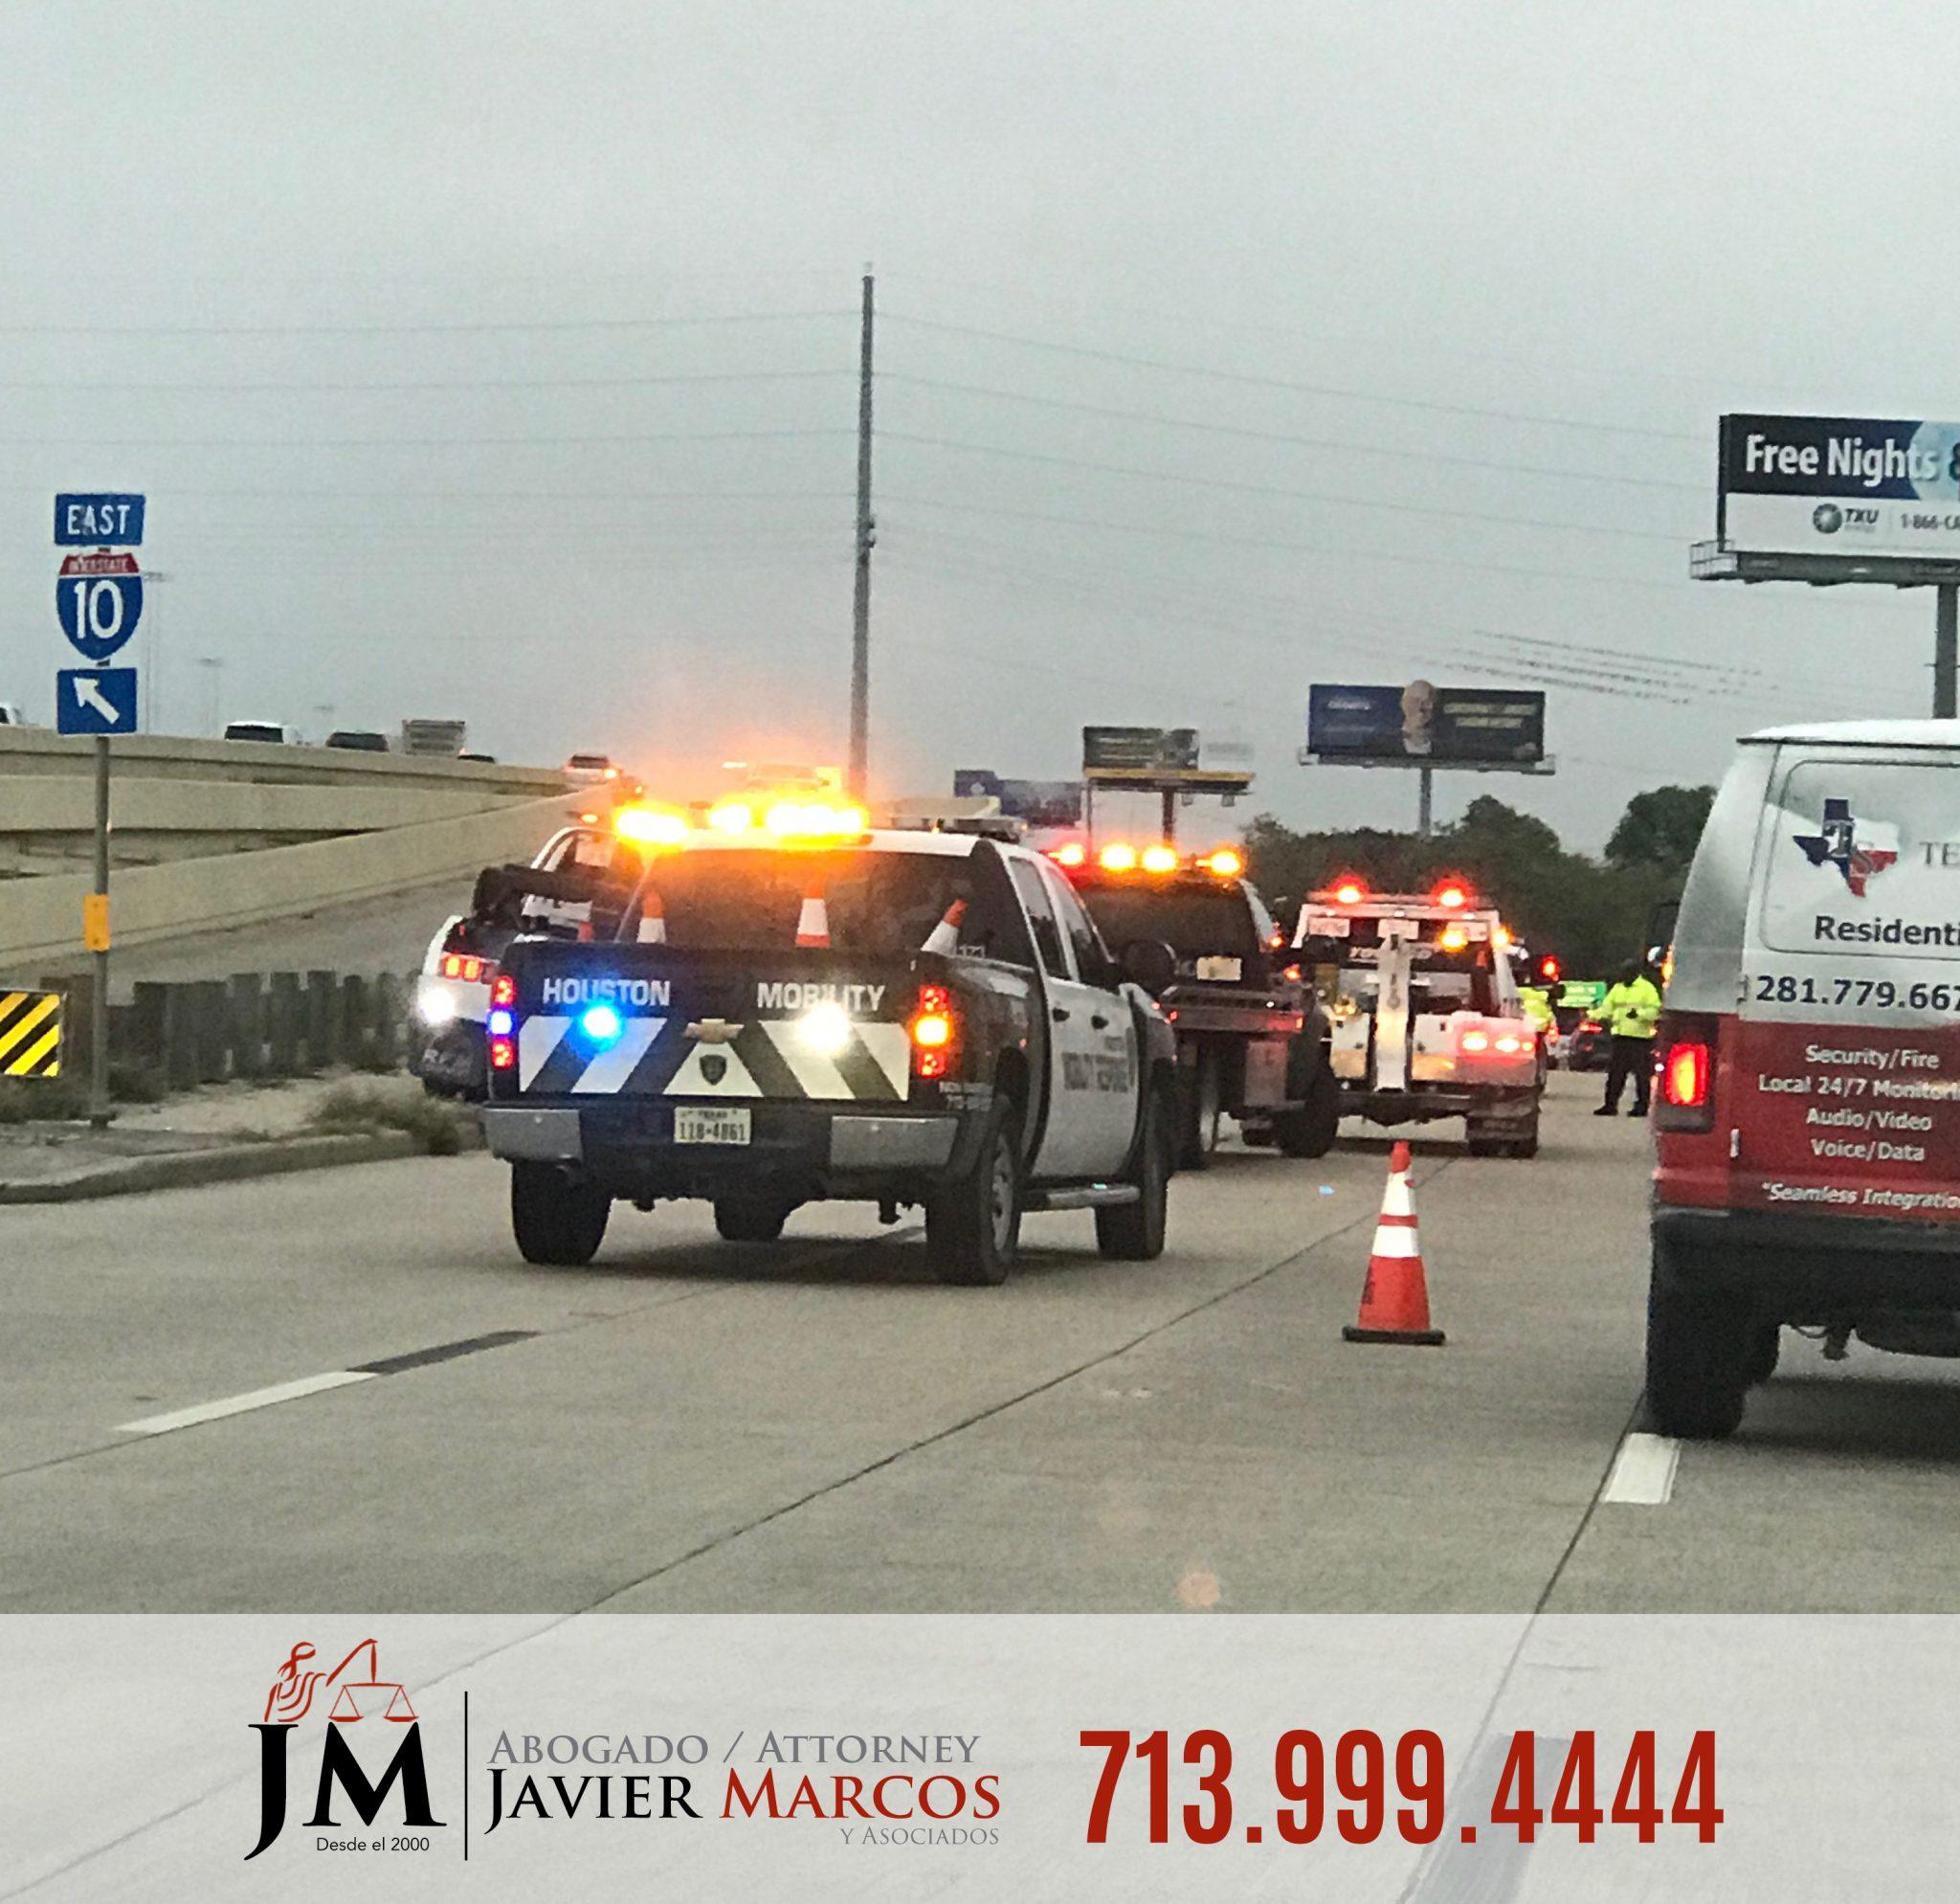 Abogado accidente trailer | Abogado Javier Marcos | 713.999.4444